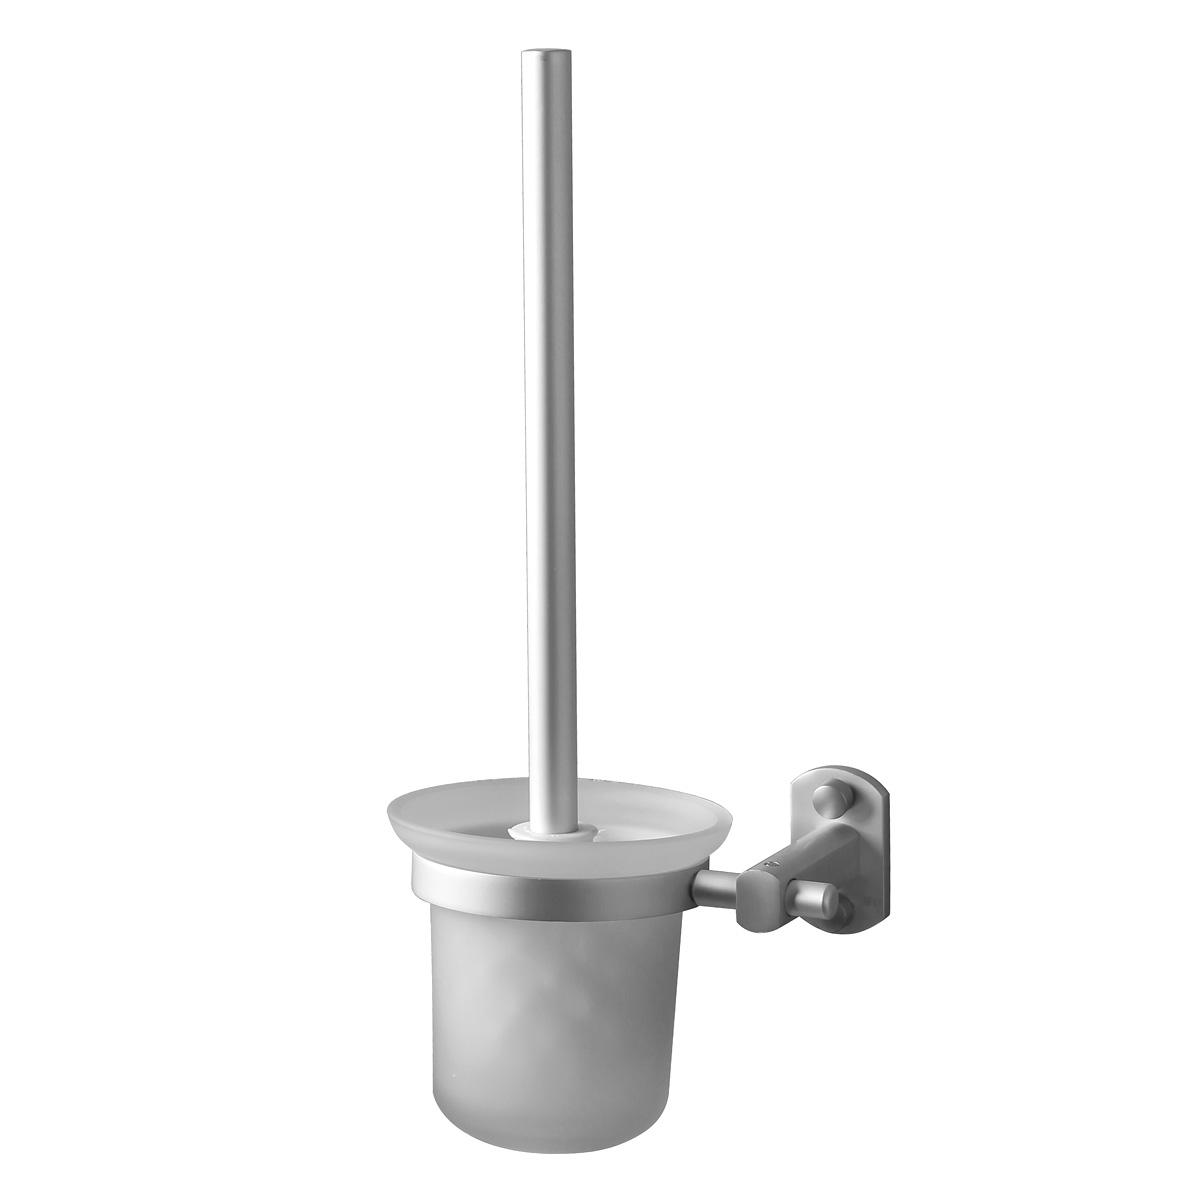 aluminium glas wc b rste toiletten b rste badezimmer klob rste bad ebay. Black Bedroom Furniture Sets. Home Design Ideas